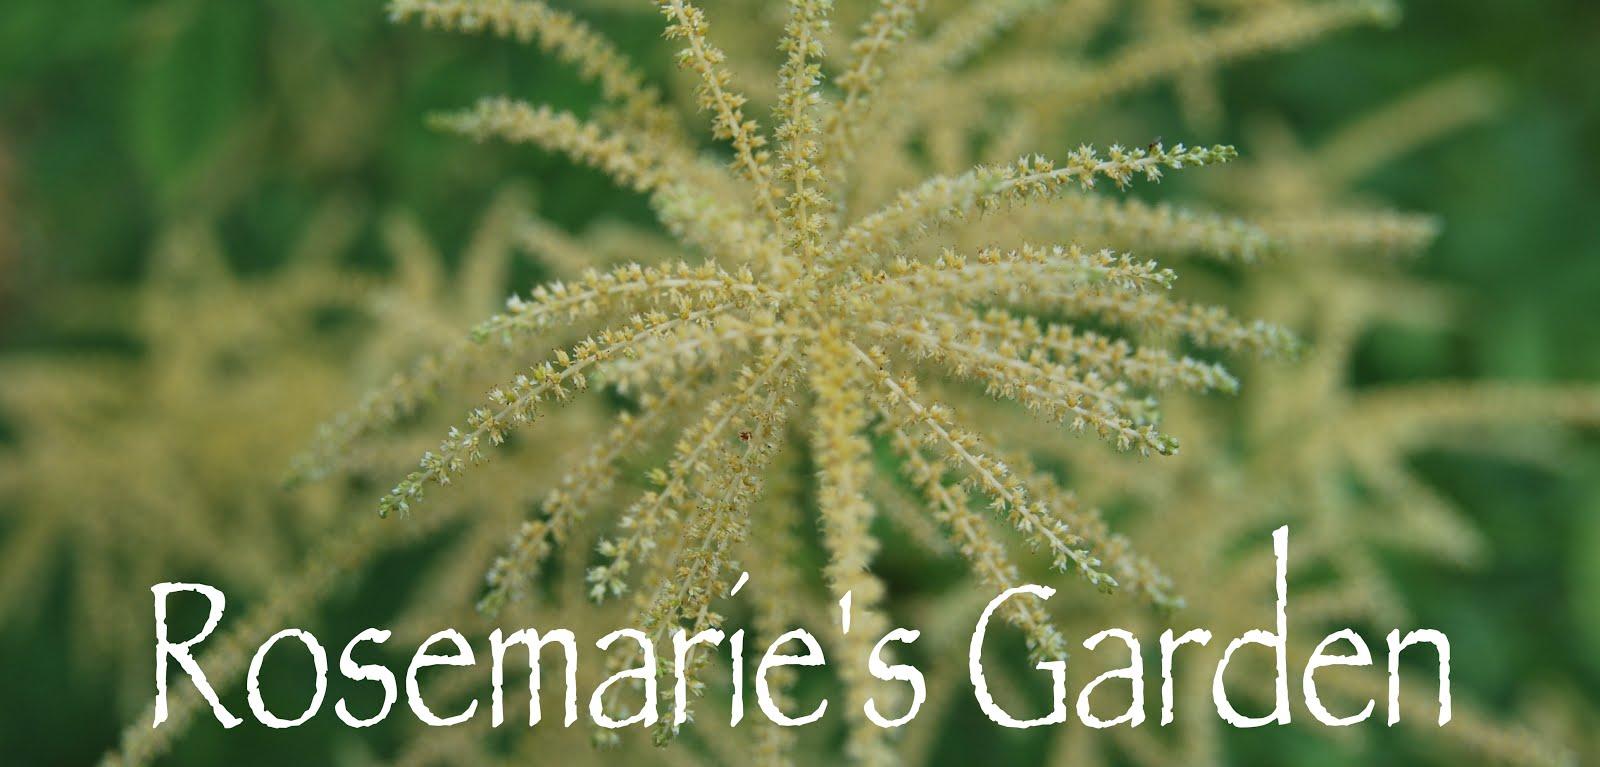 Rosemarie's Garden